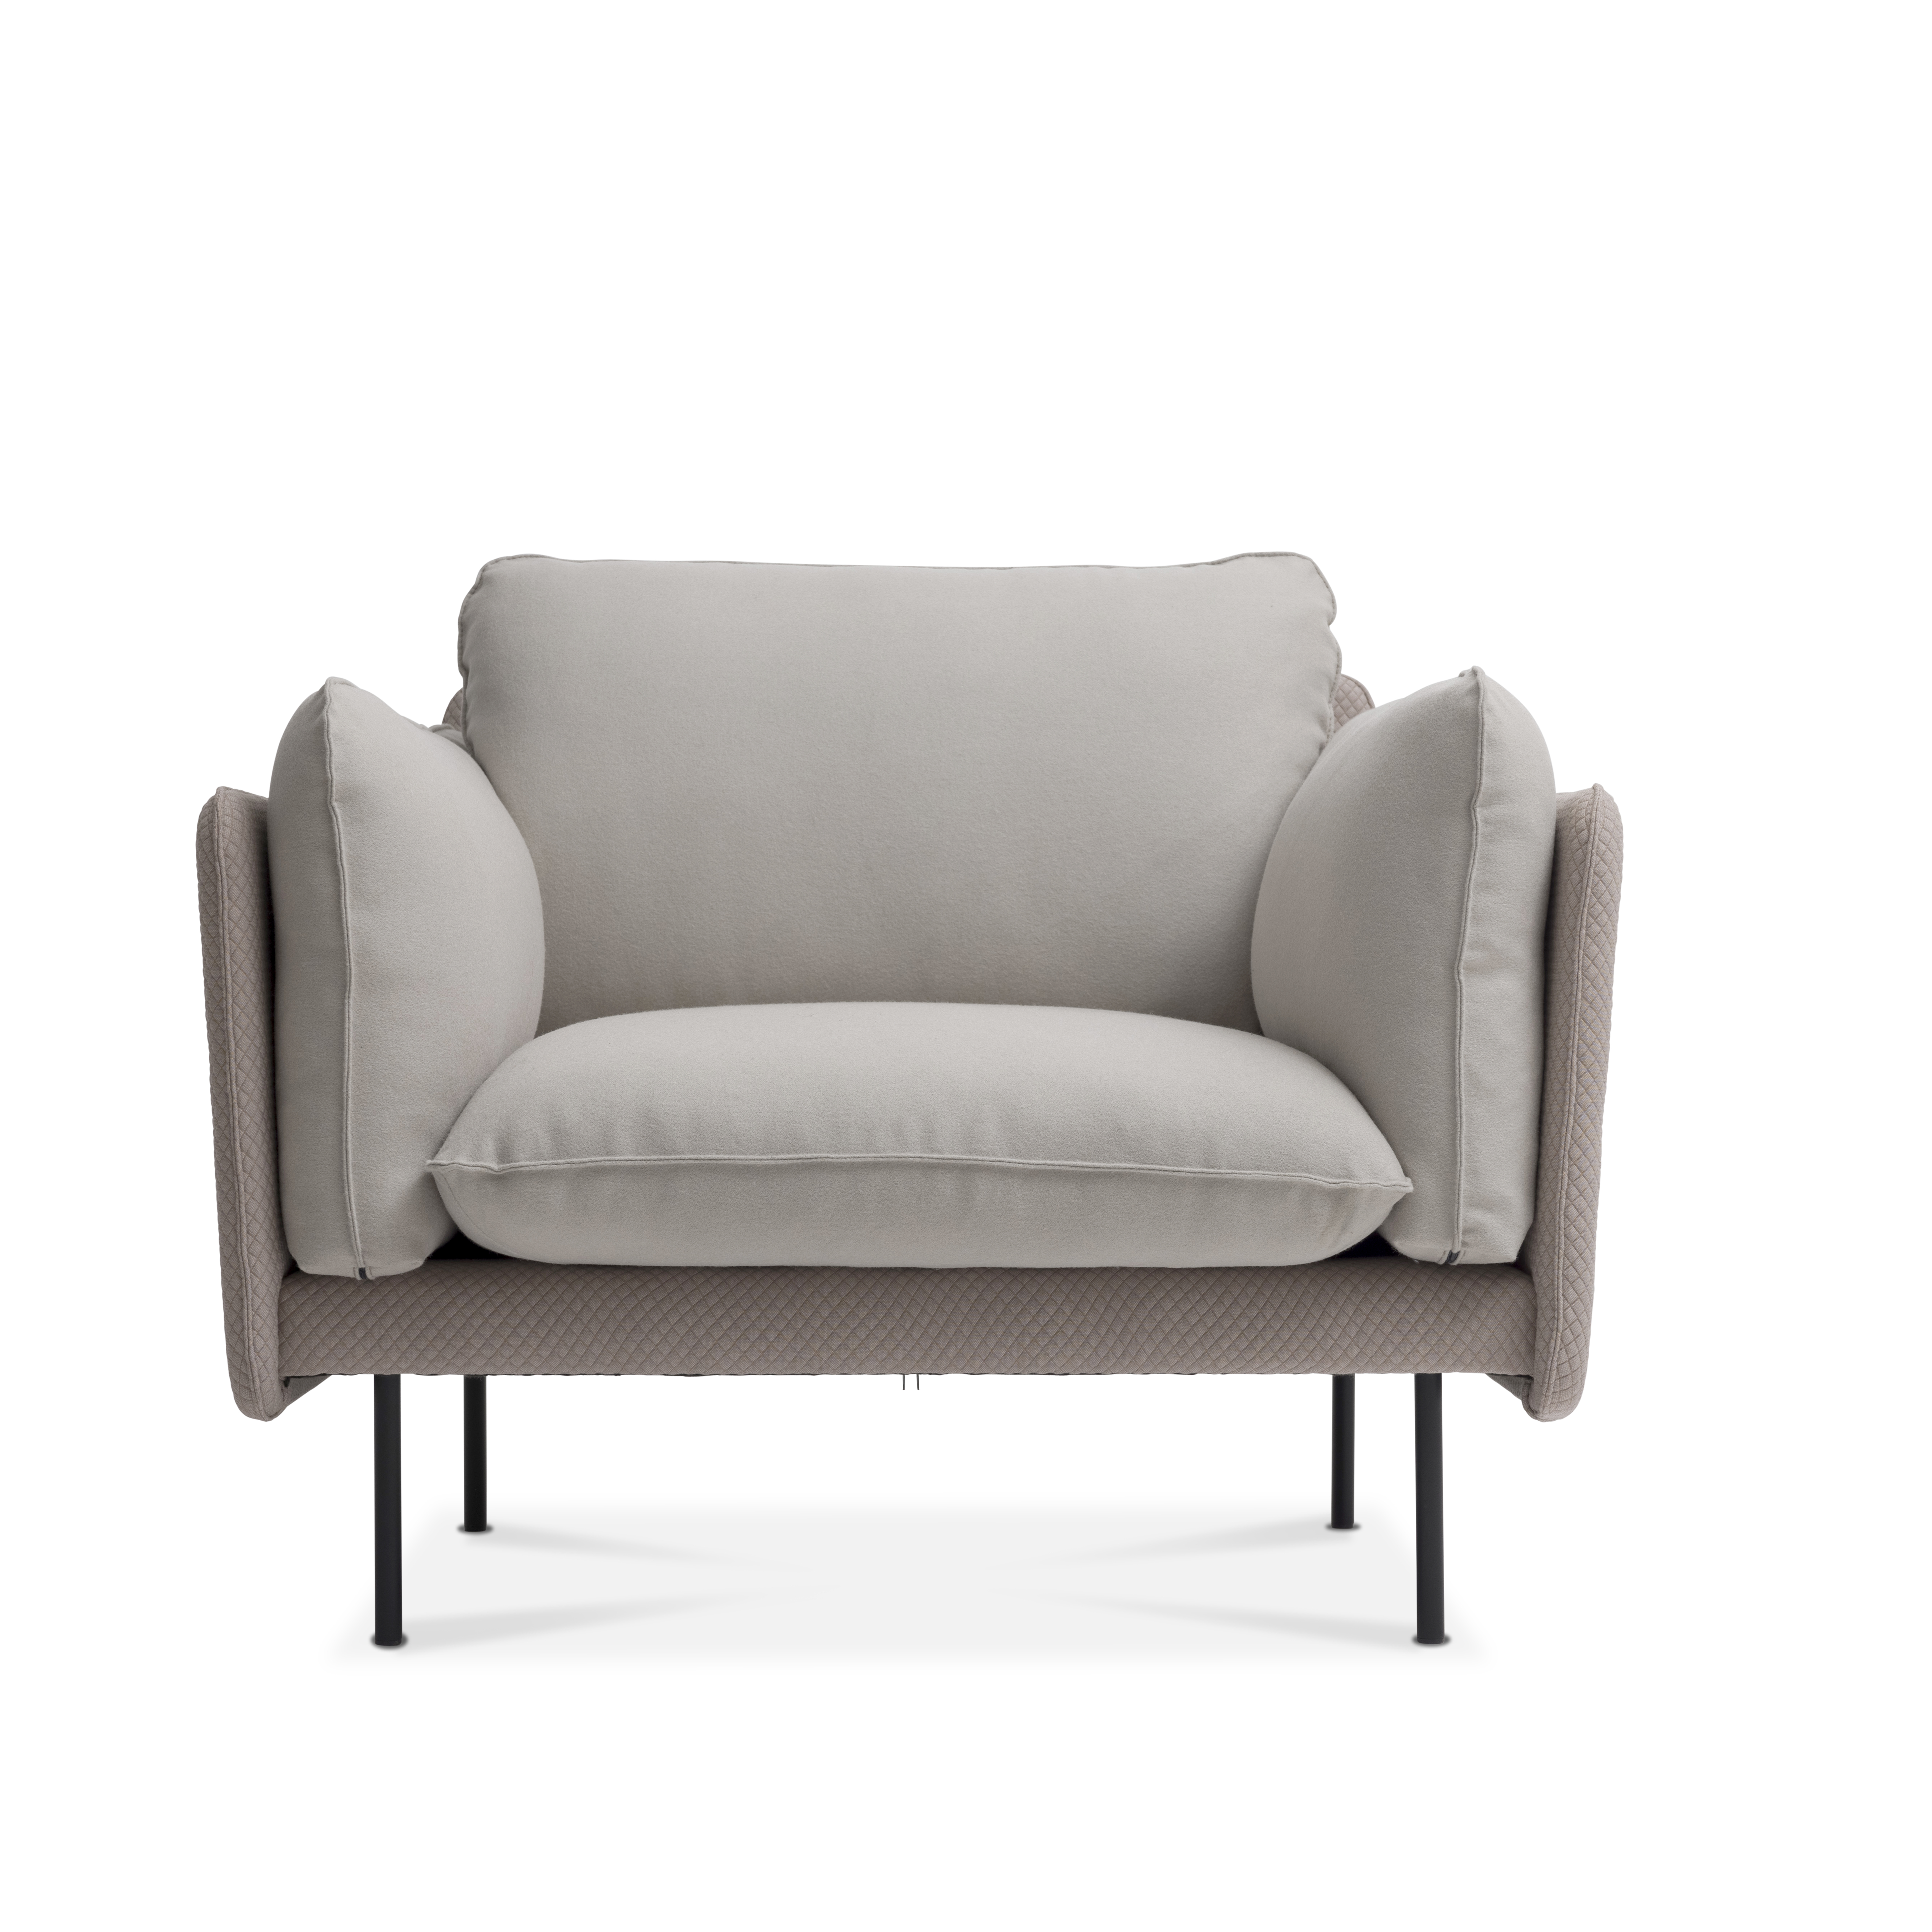 Otis stol i to tekstiler soft seating fra Fora Form